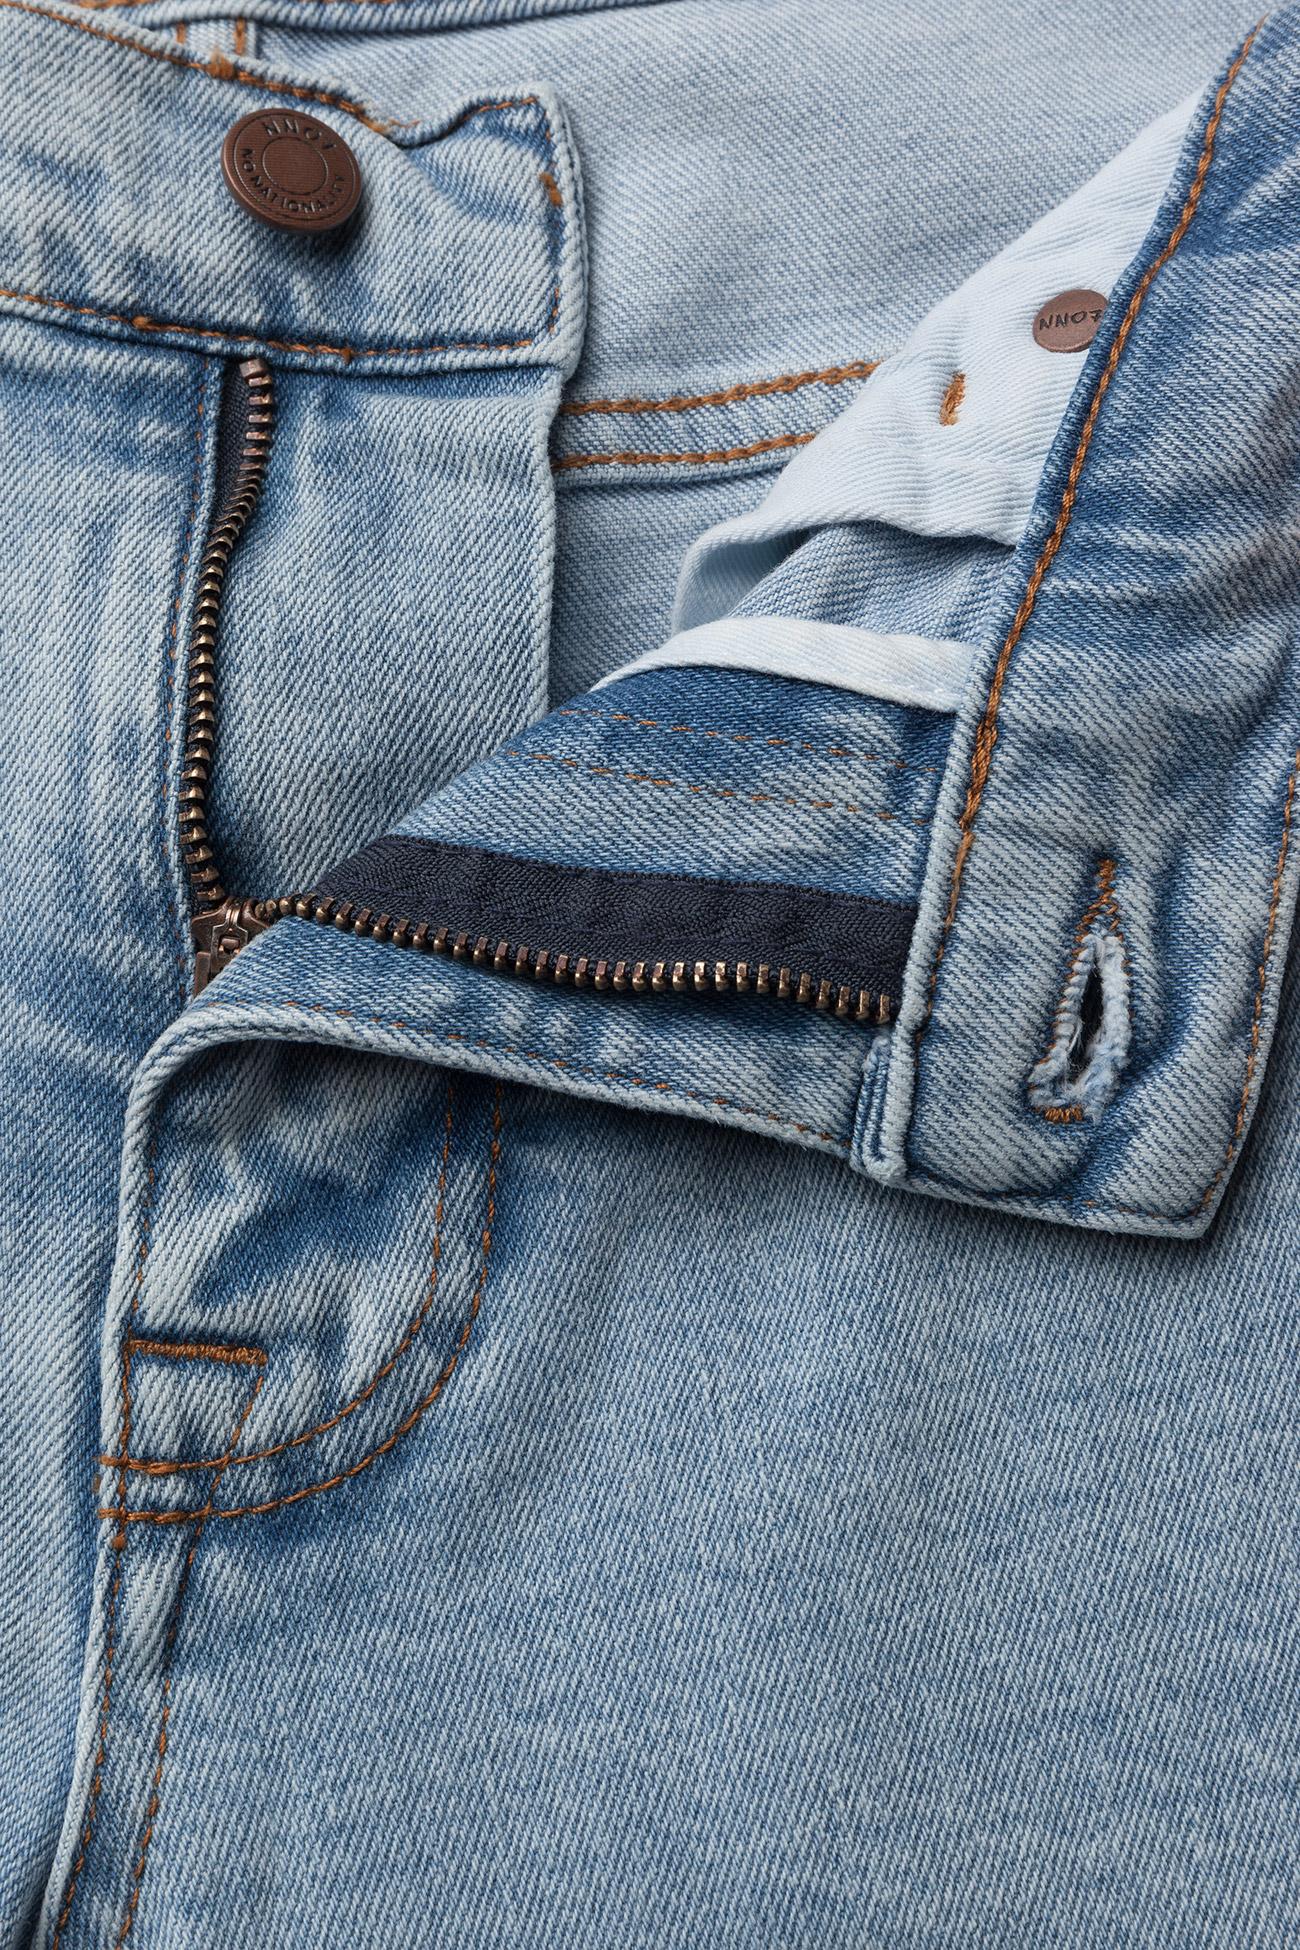 Nn07 Wilson 1771 L32 - Jeans Light Indigo